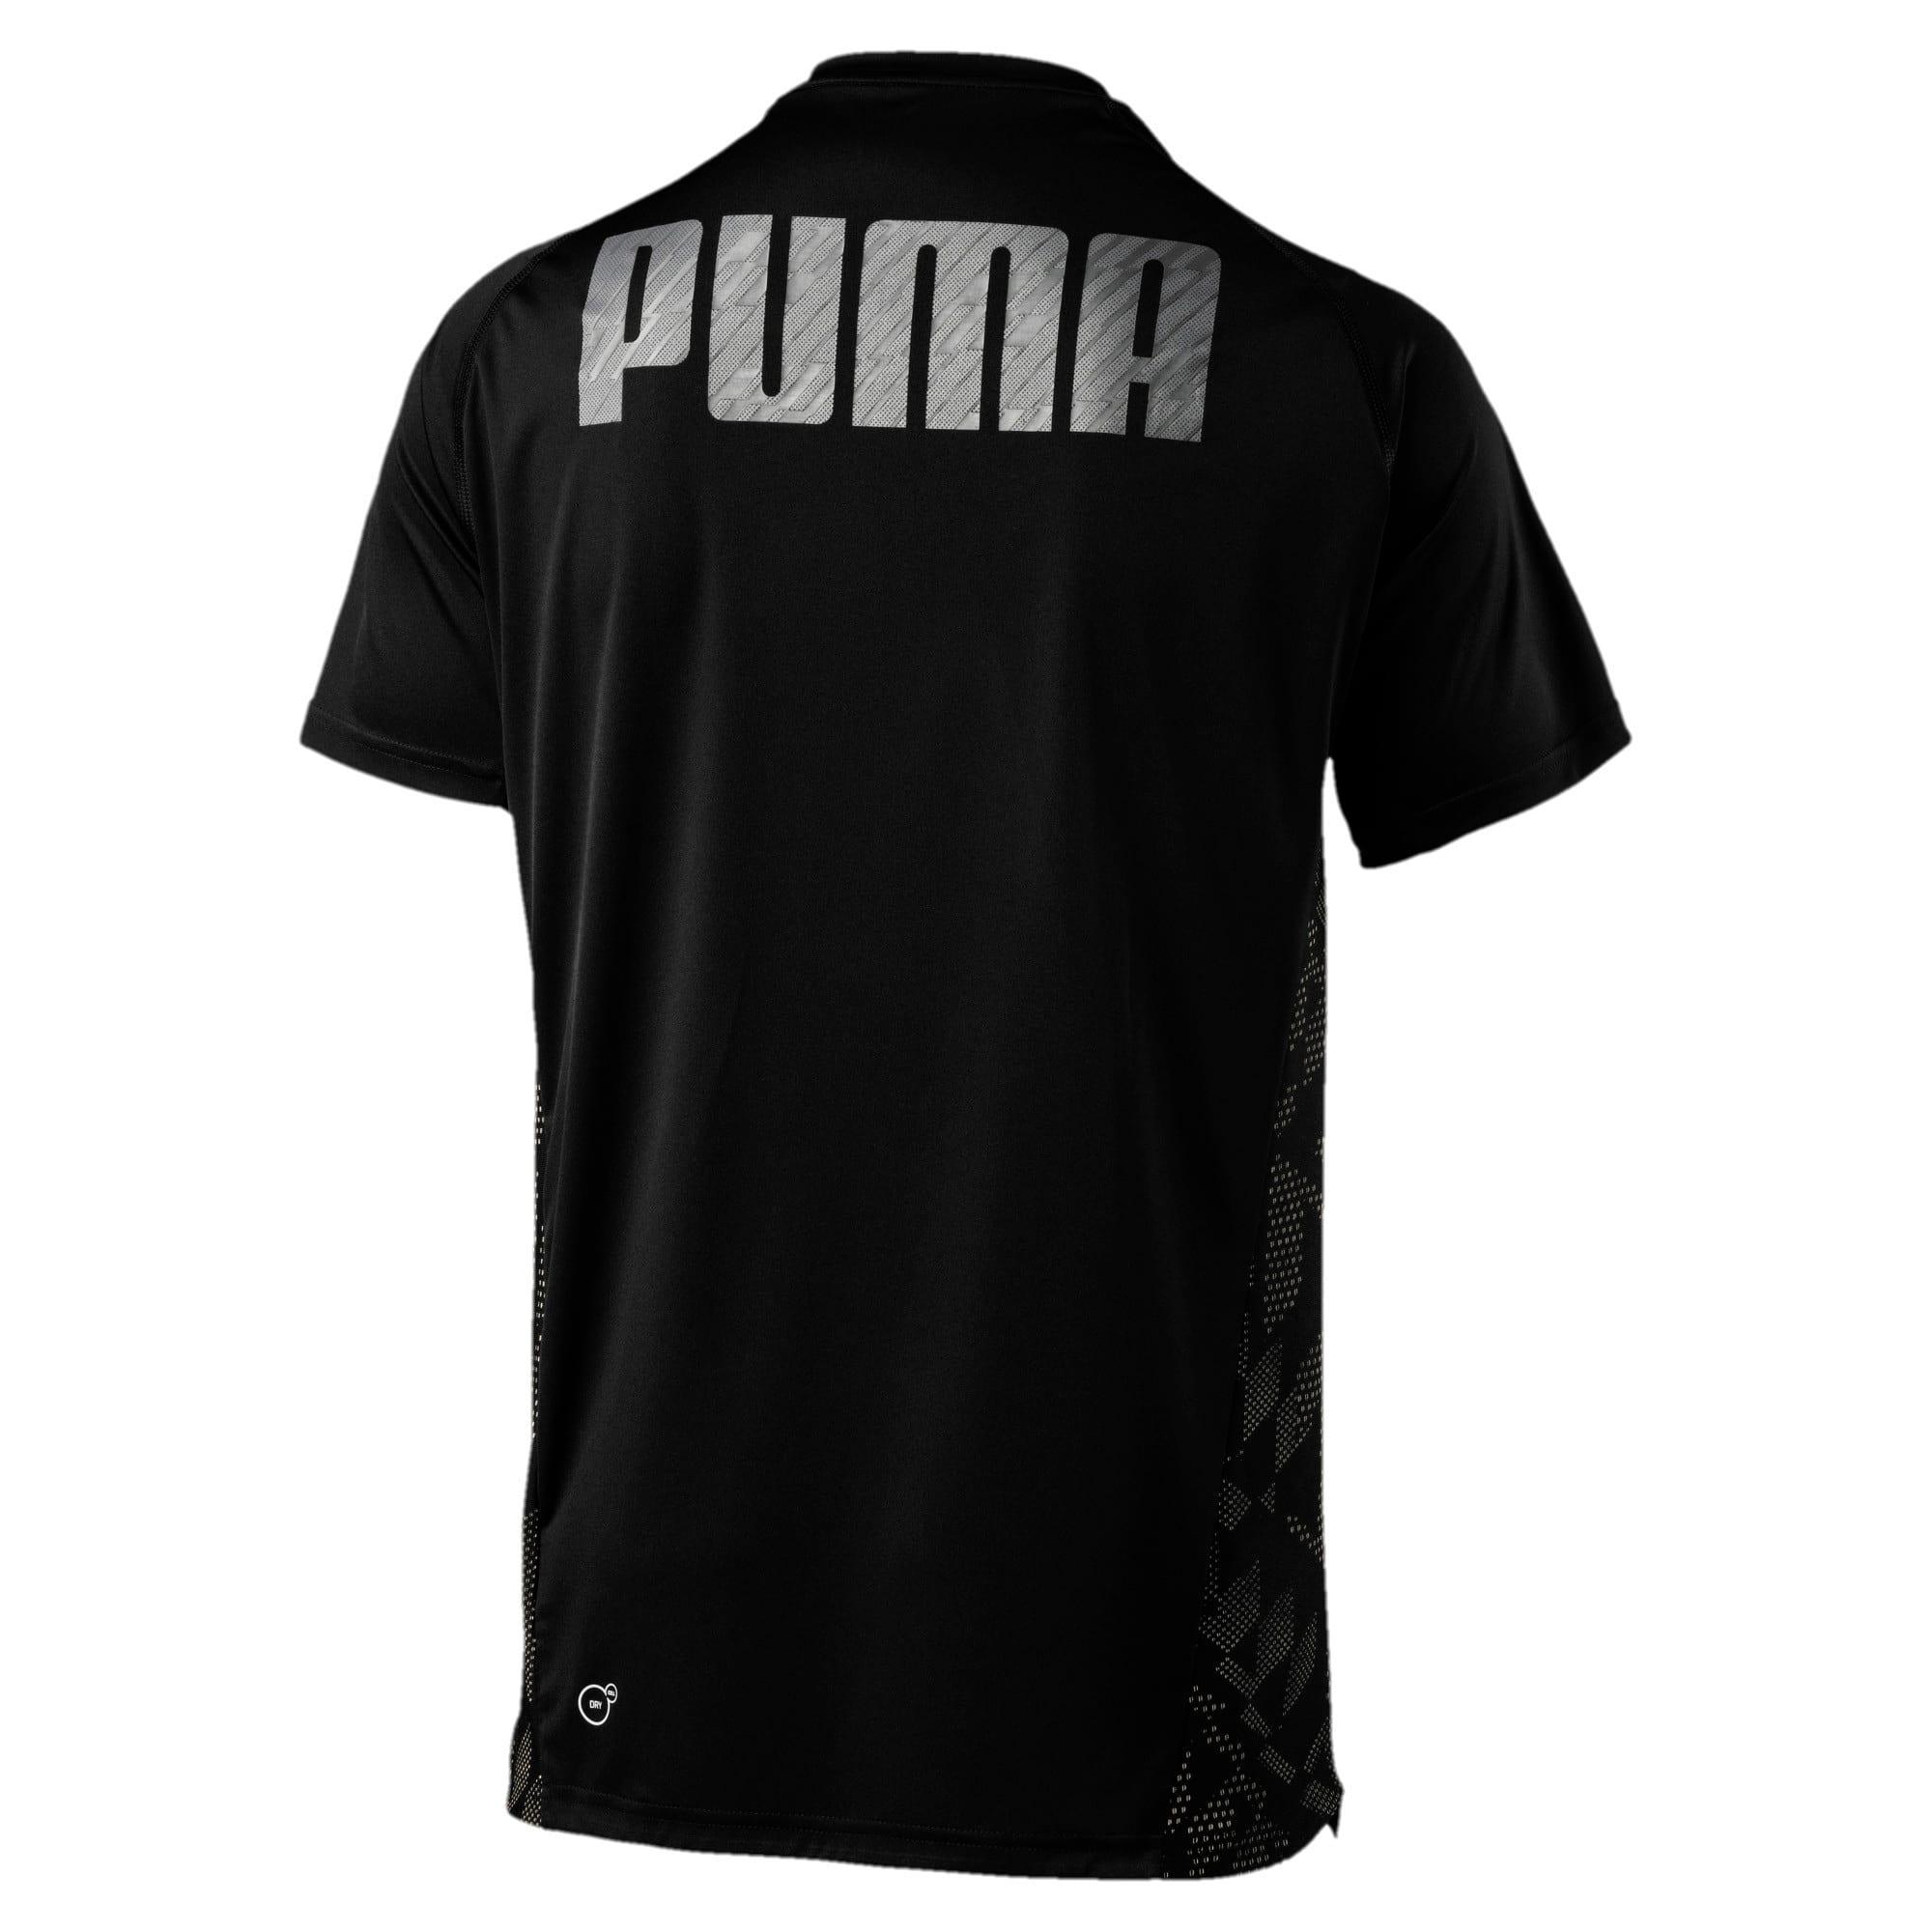 Thumbnail 5 of VENT Short Sleeve Men's Training Top, Puma Black-Q4, medium-IND